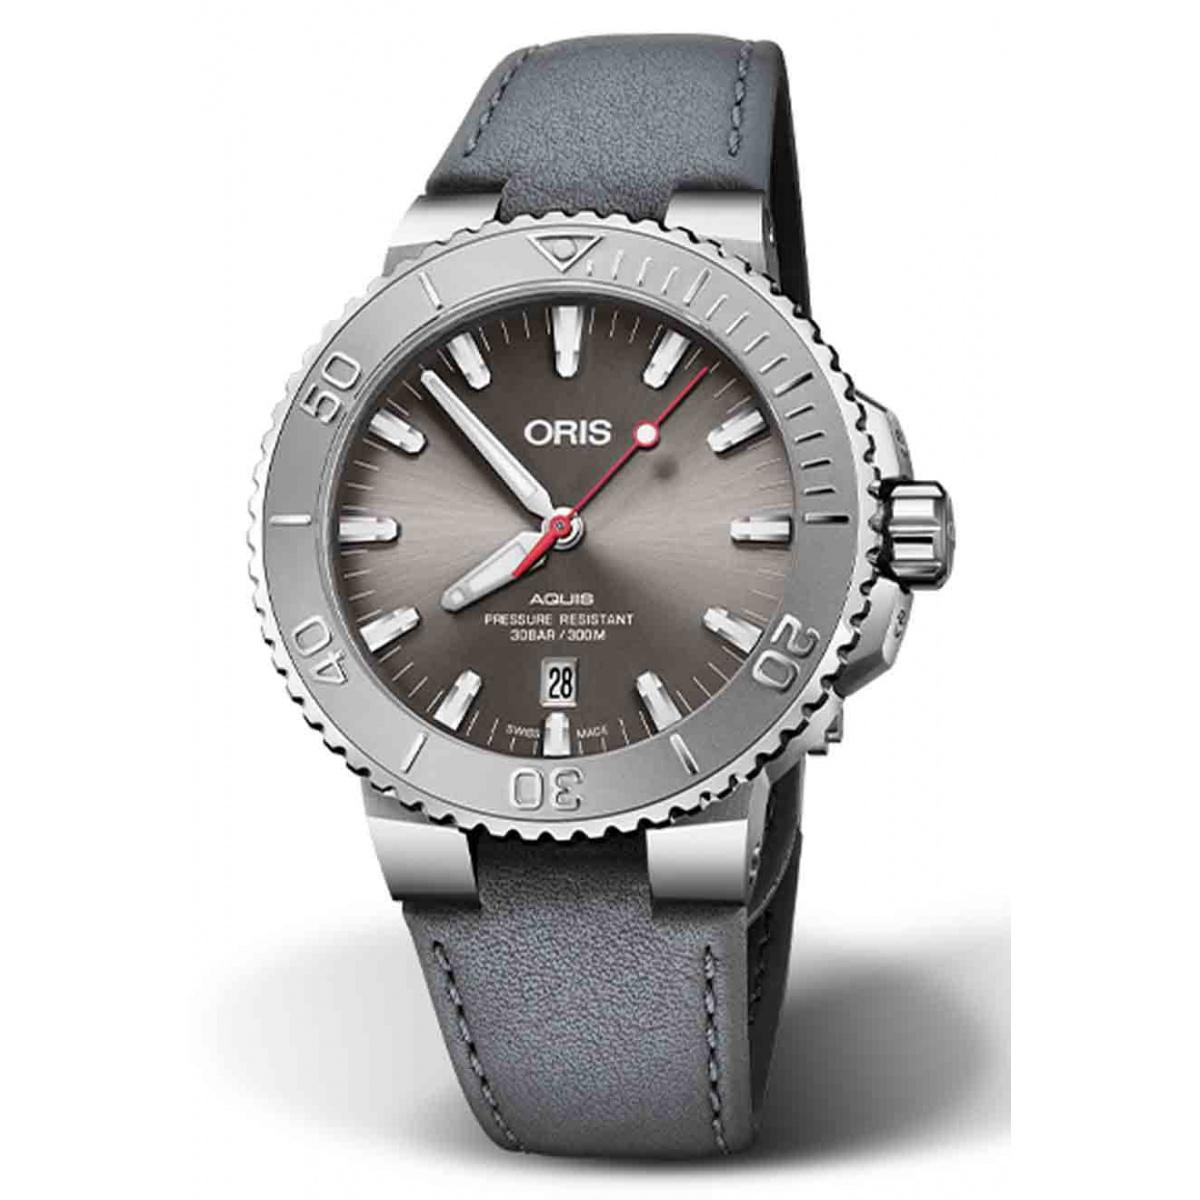 ORIS AQUIS DATE RELIEF 300 M ∅43,5 mm, Esfera gris, brazalete de piel gris